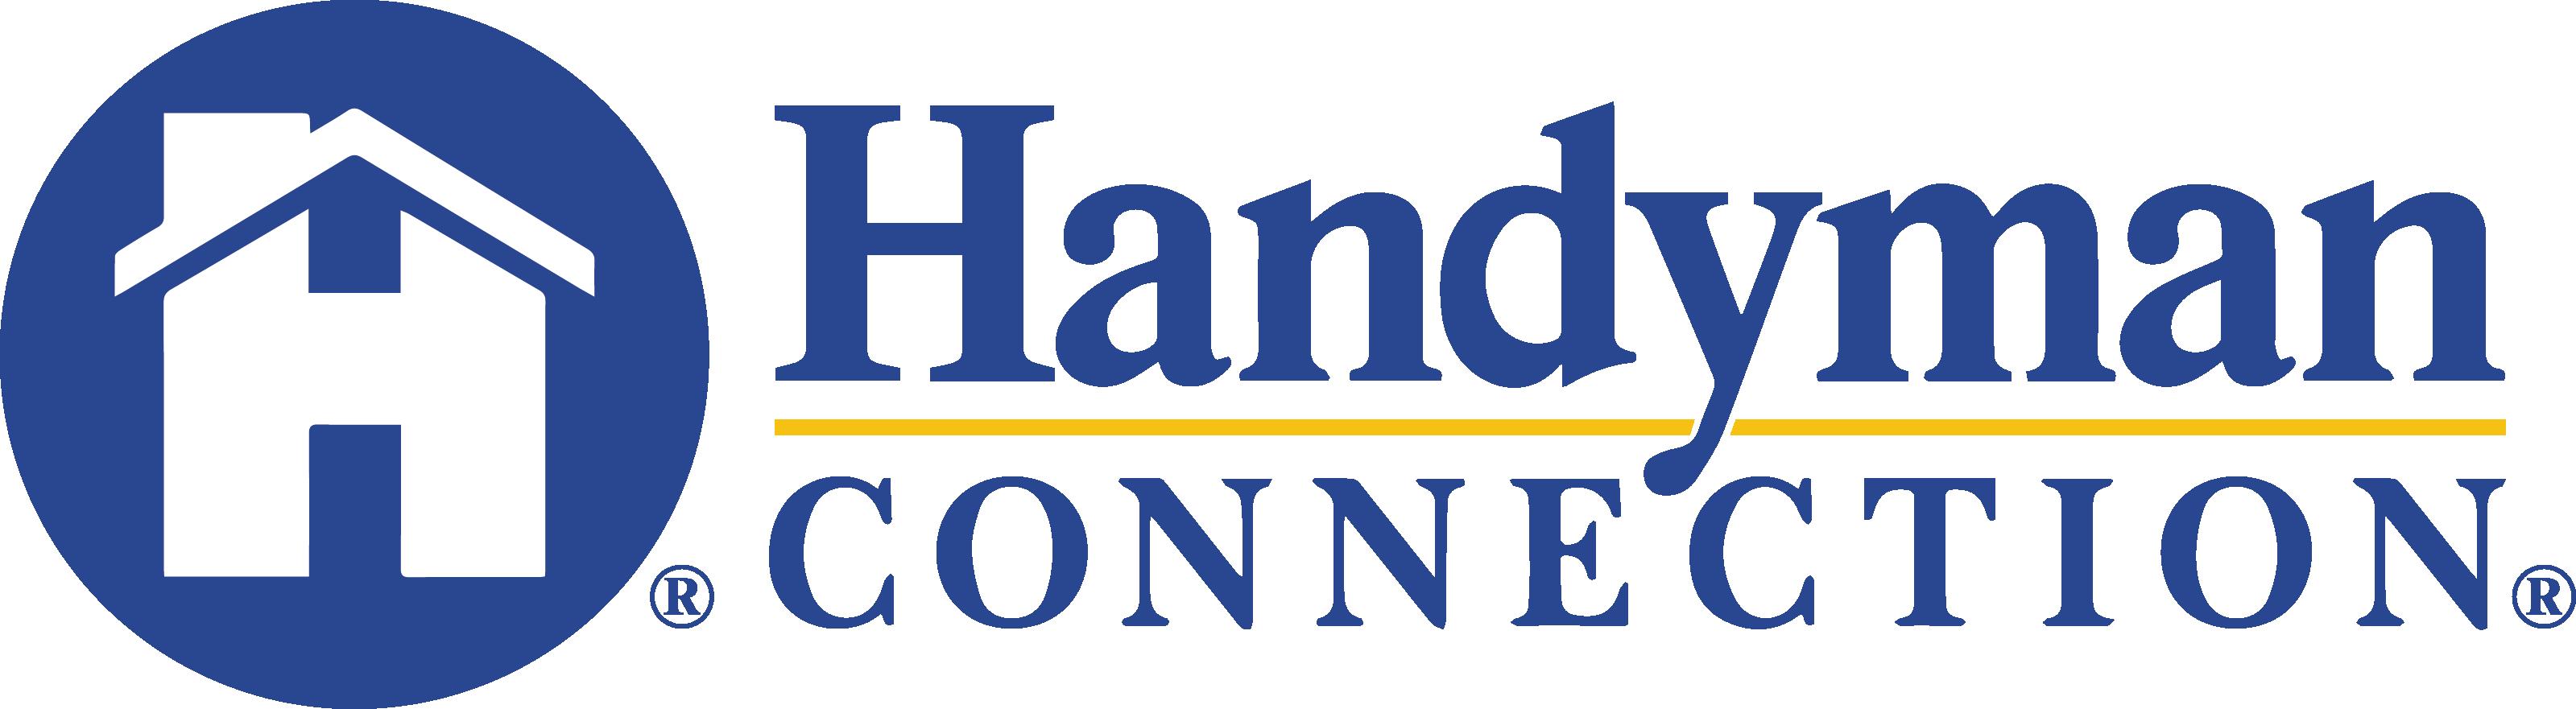 Handyman Connection of Ottawa, ON